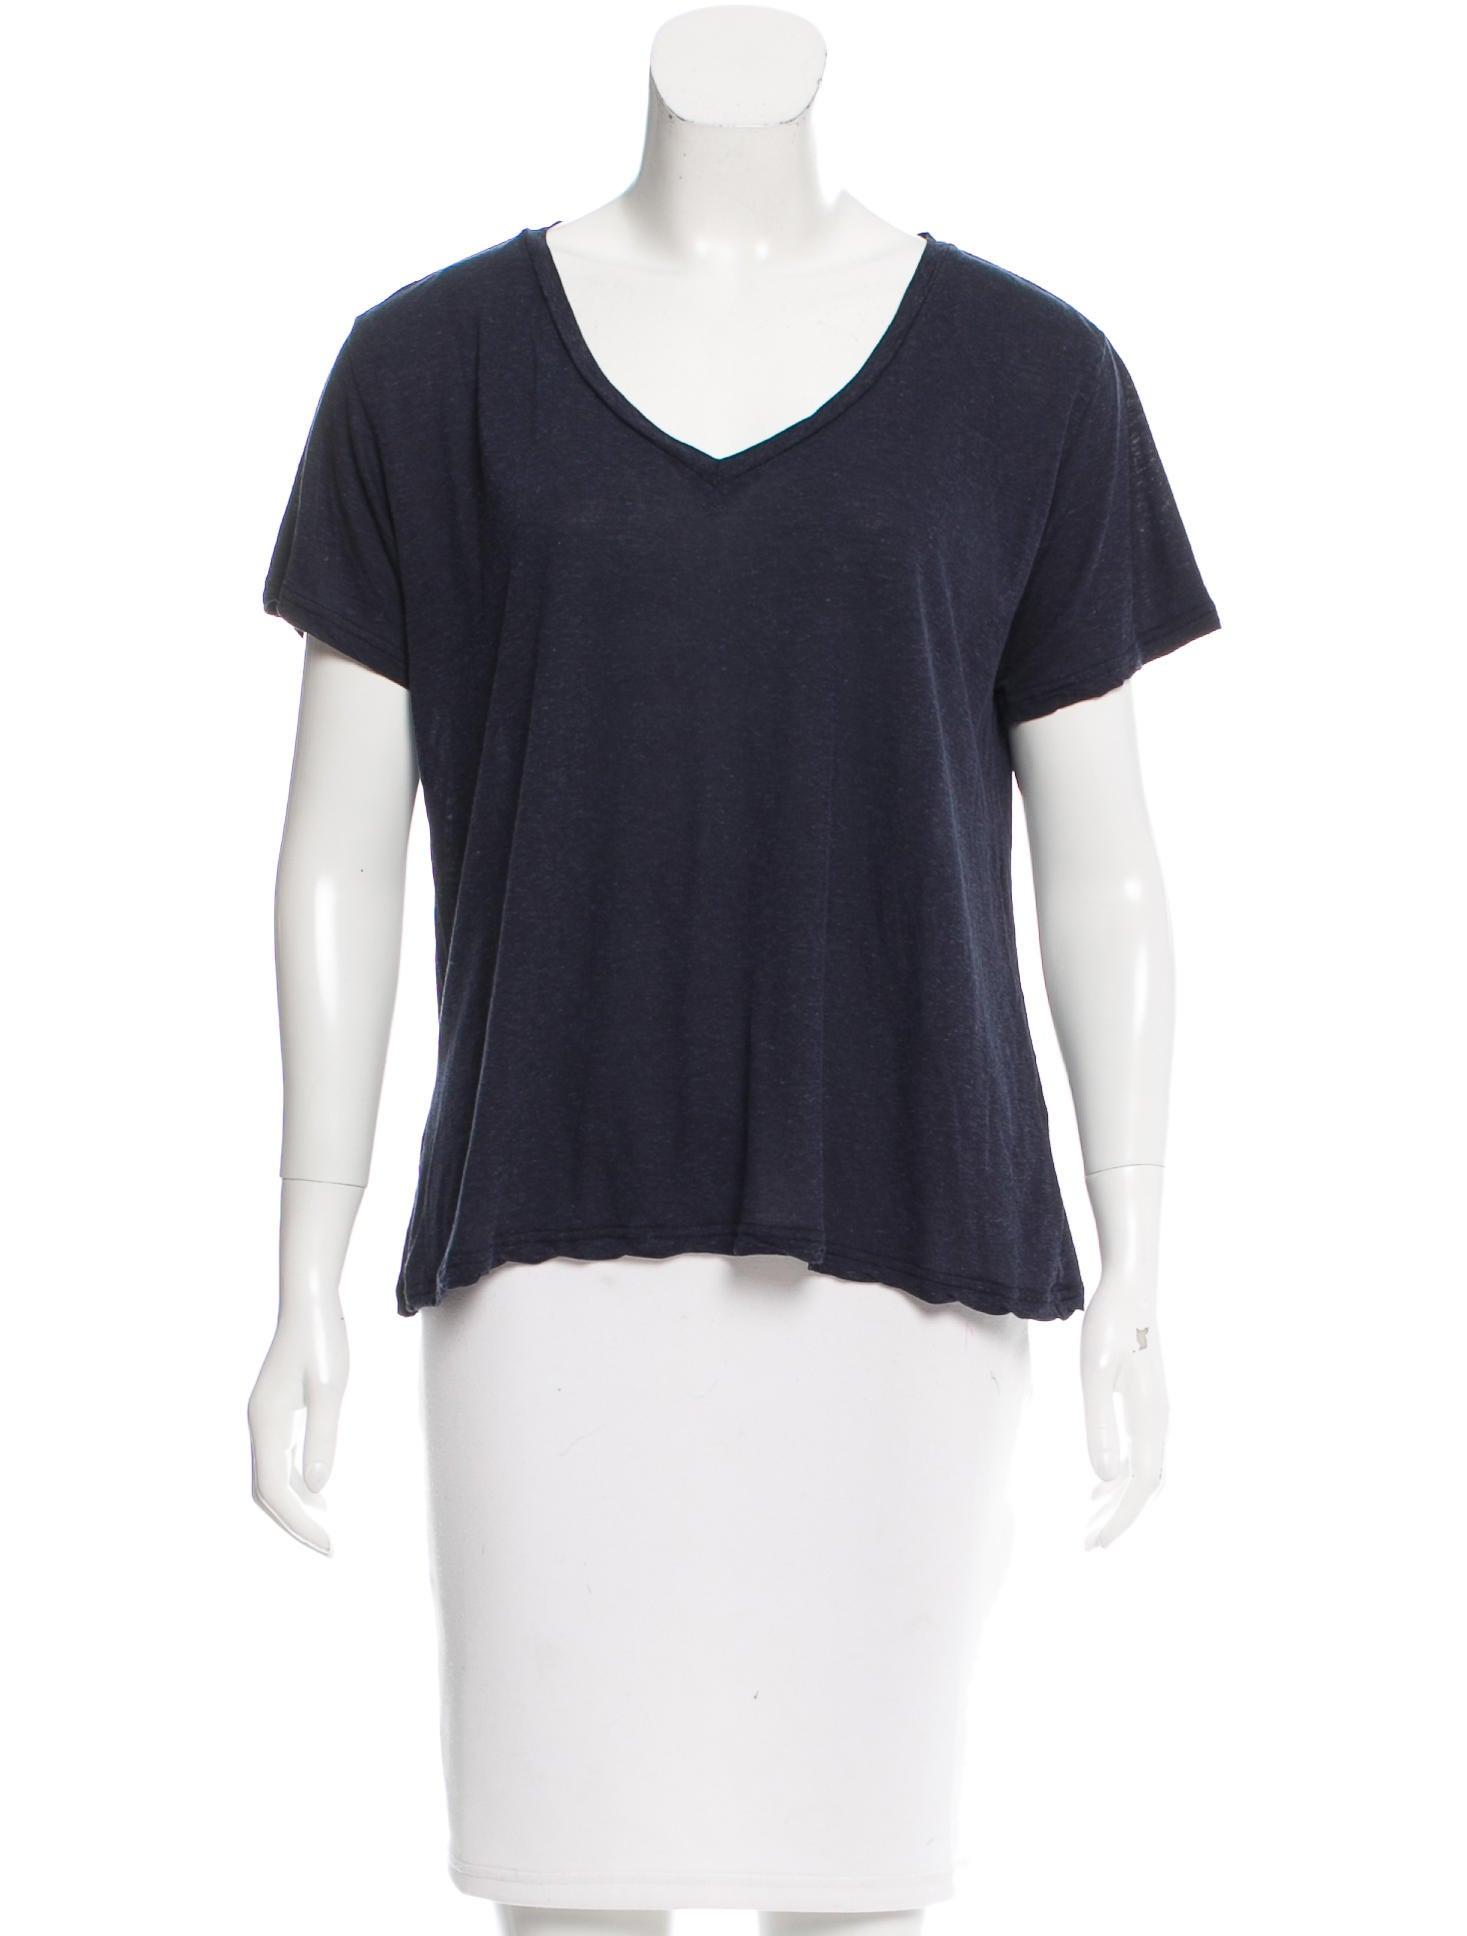 J brand short sleeve v neck t shirt clothing wjb28930 for Branded v neck t shirts